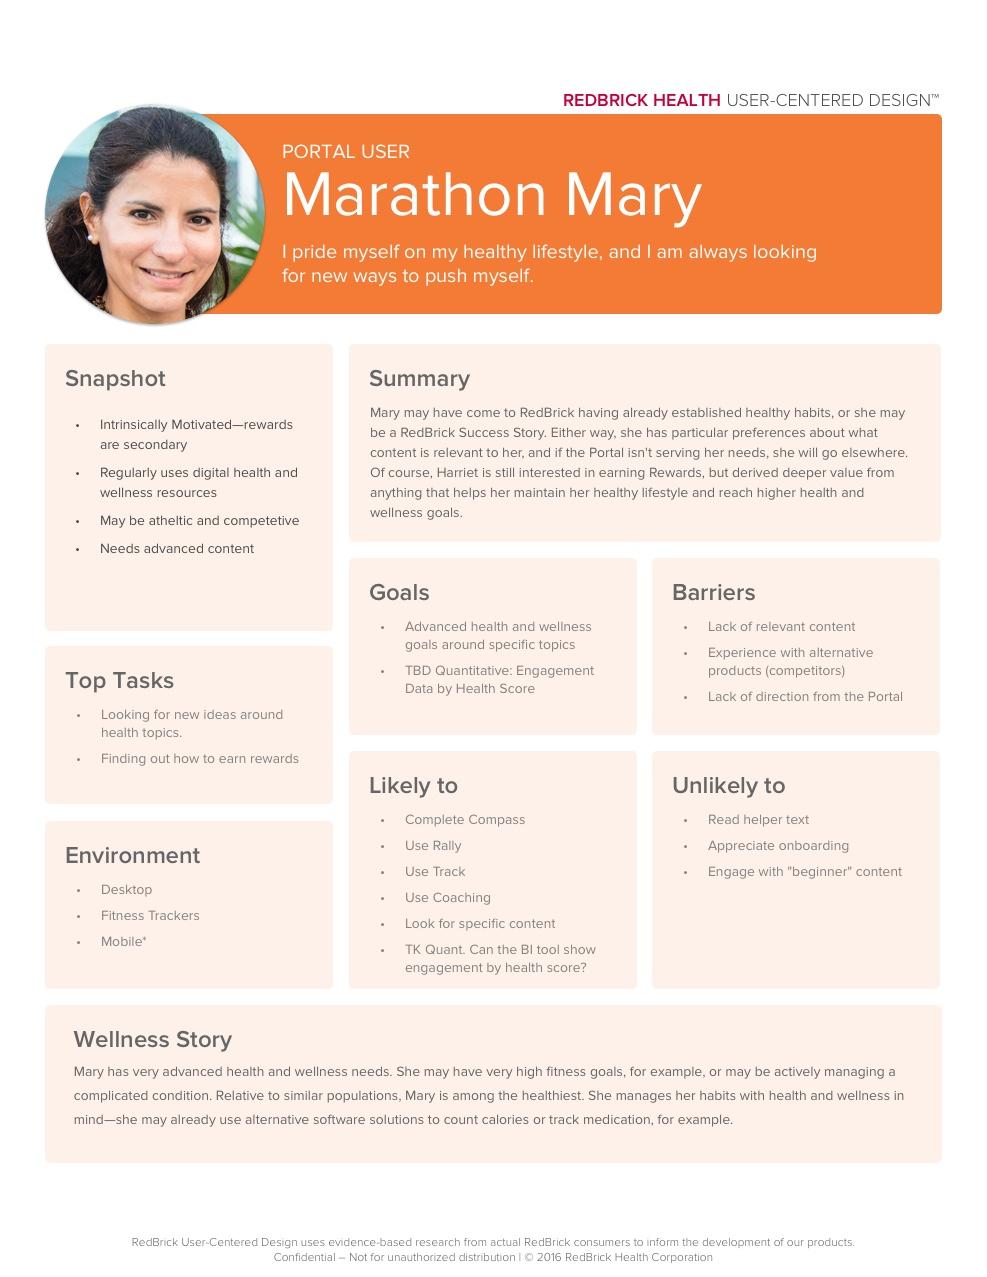 Portal User - Marathon Mary.jpg